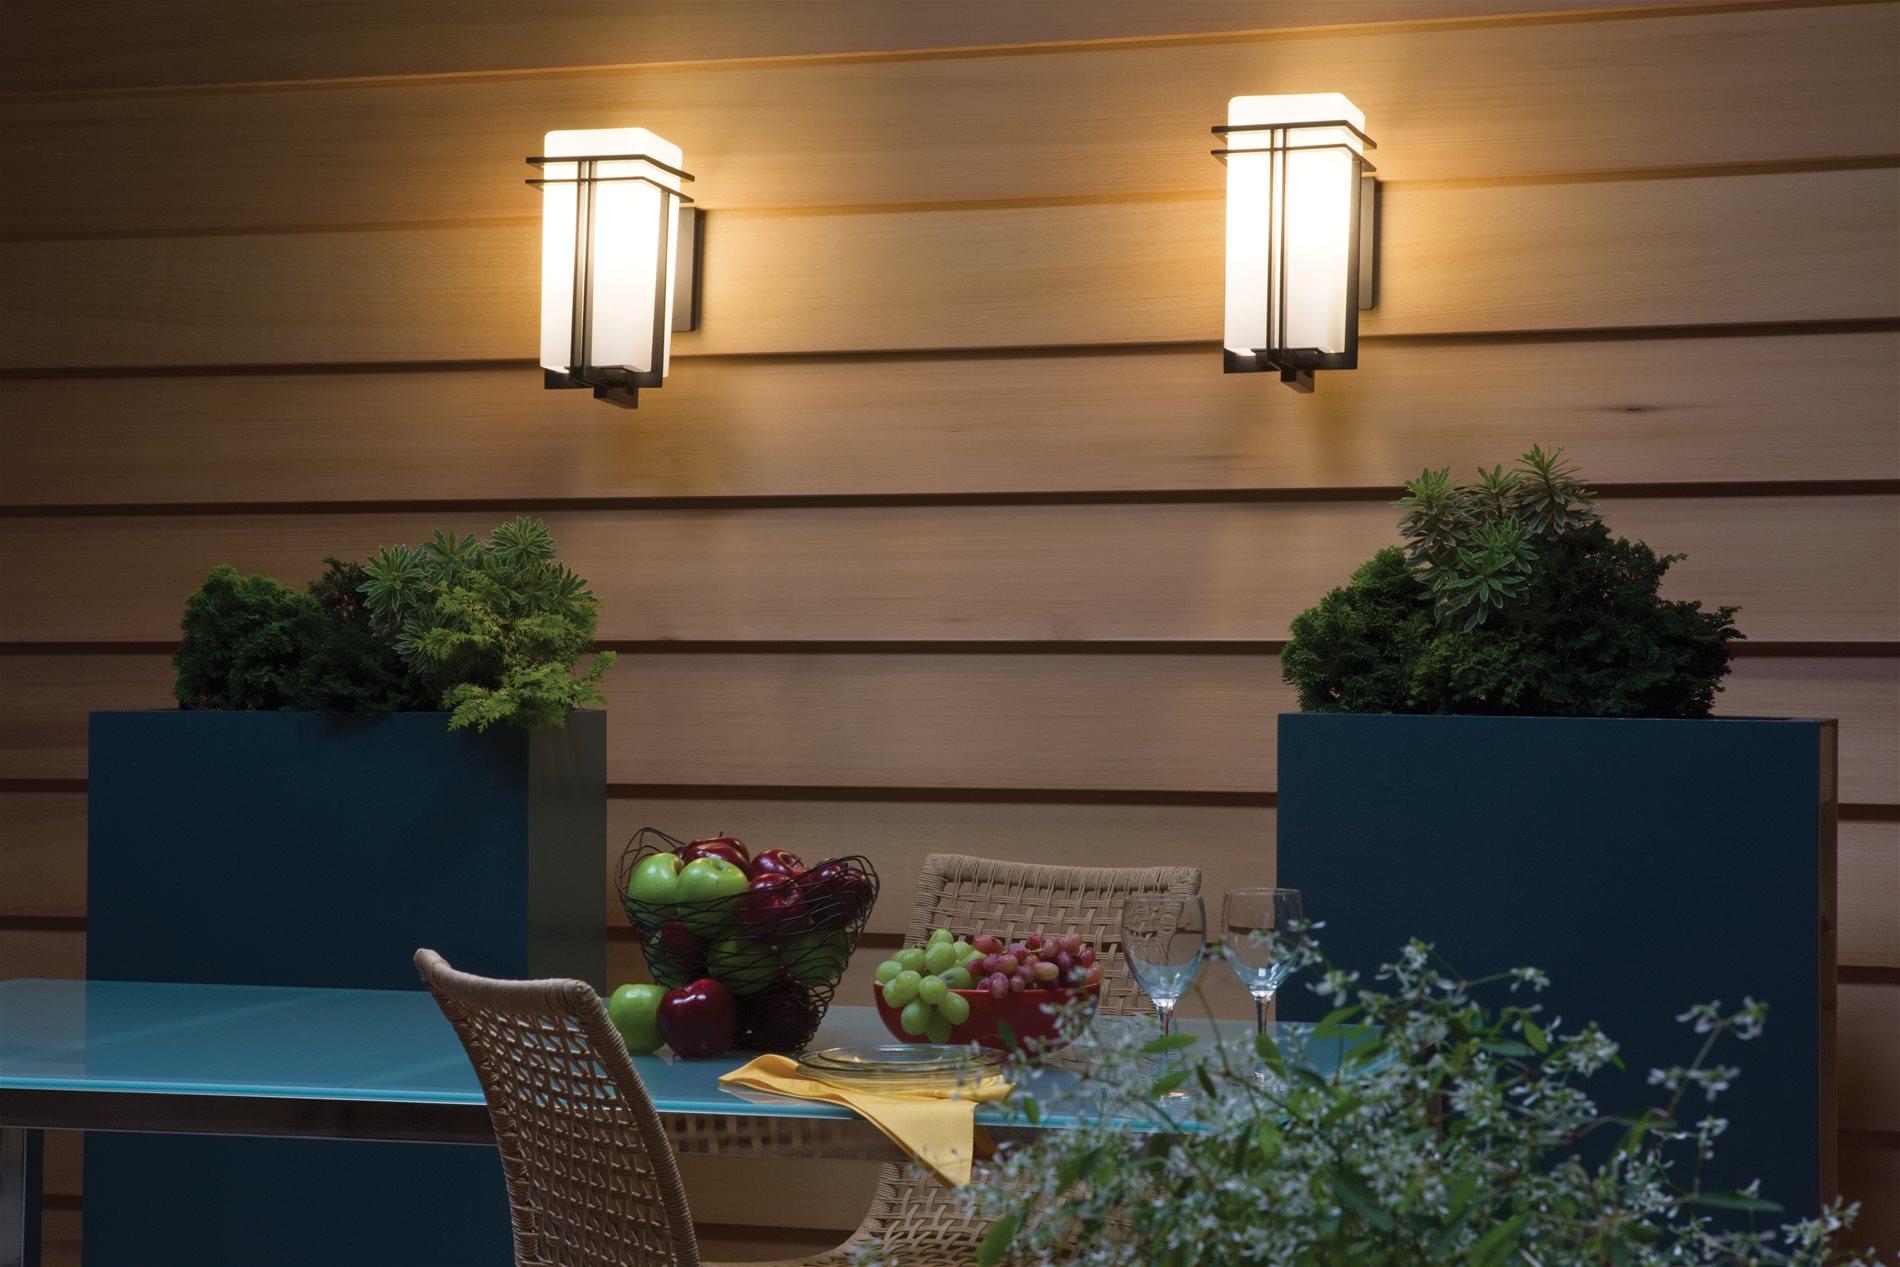 Kichler Lighting 49201bk Tremillo Modern Contemporary